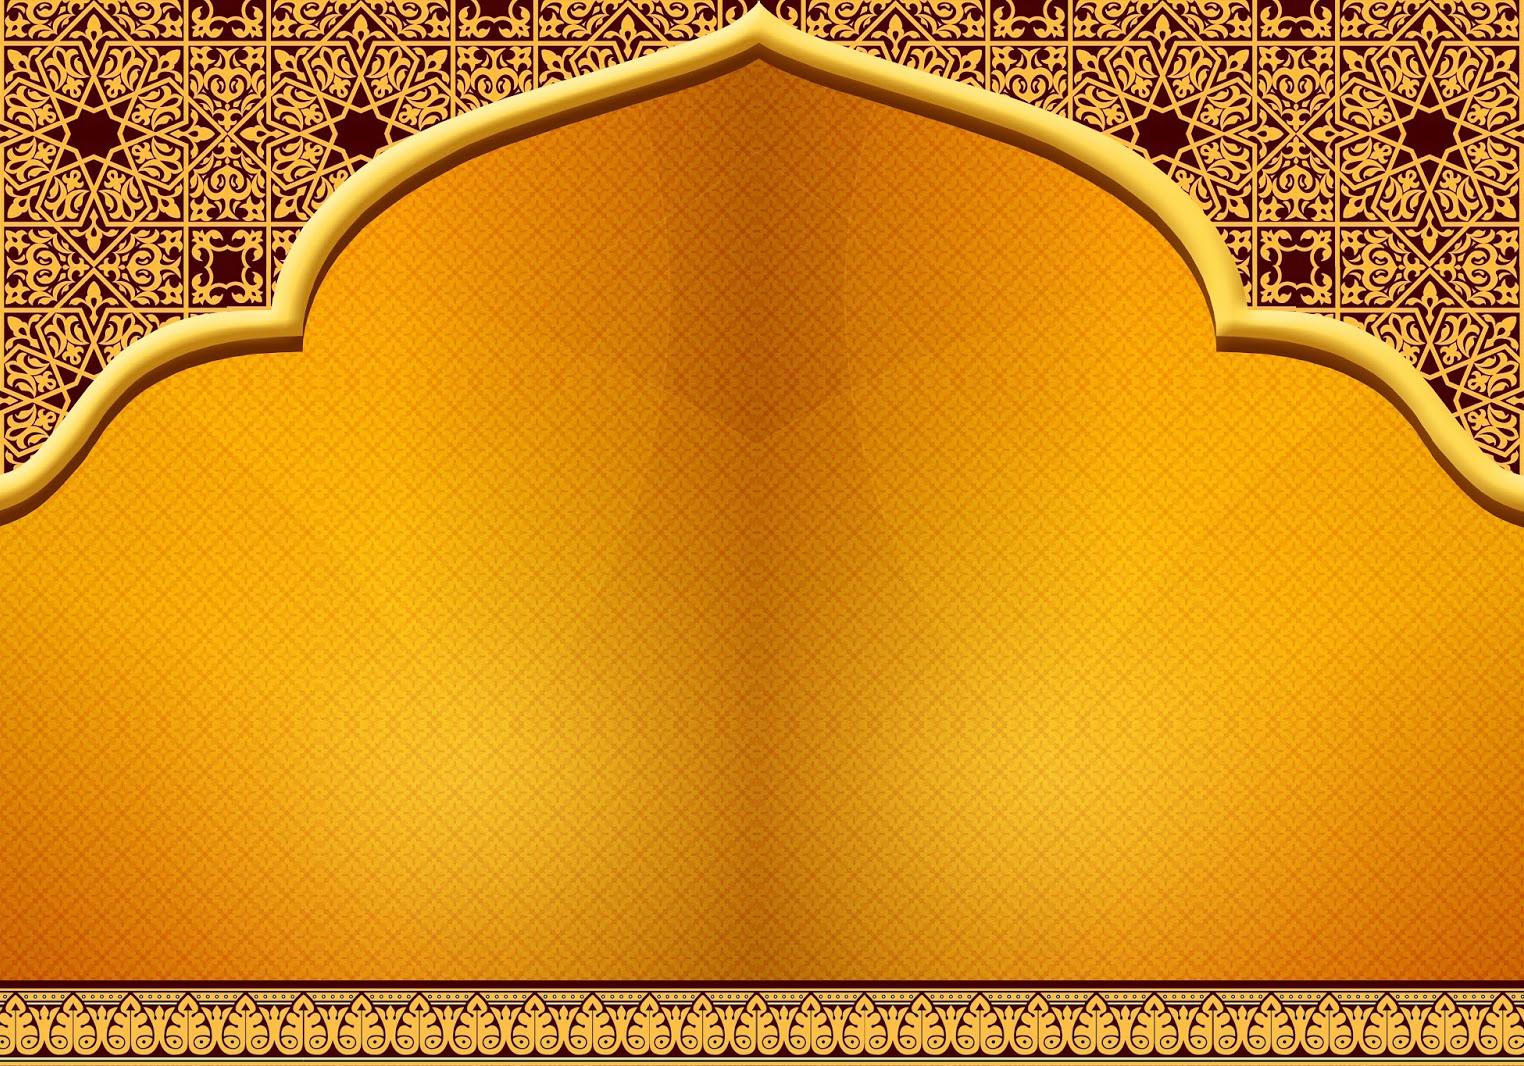 Terbaru 30 Wallpaper Islami - Richi Wallpaper